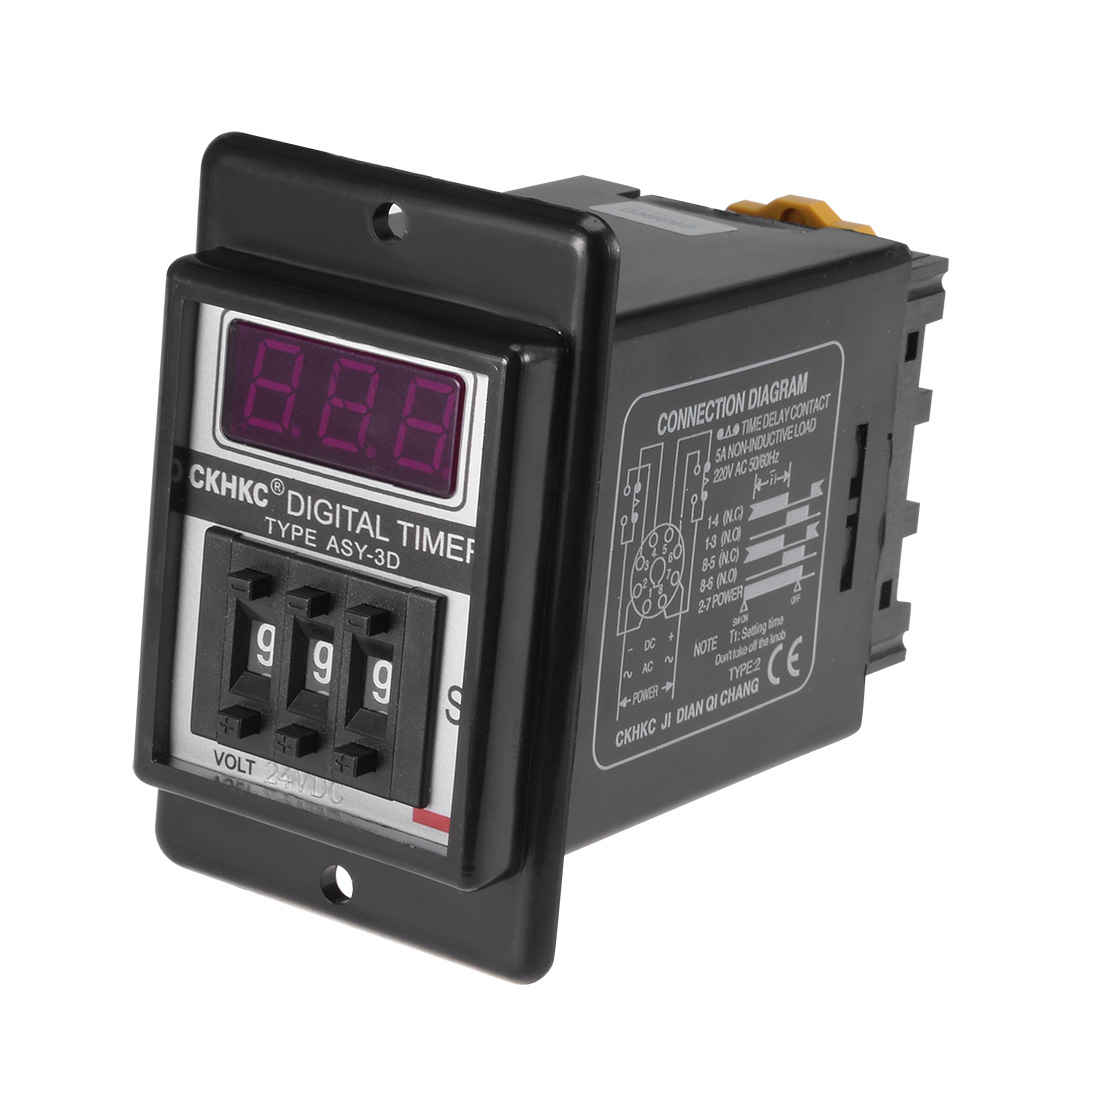 DC24V 999S 8 Terminals Range Adjustable Delay Timer Time Relay ASY